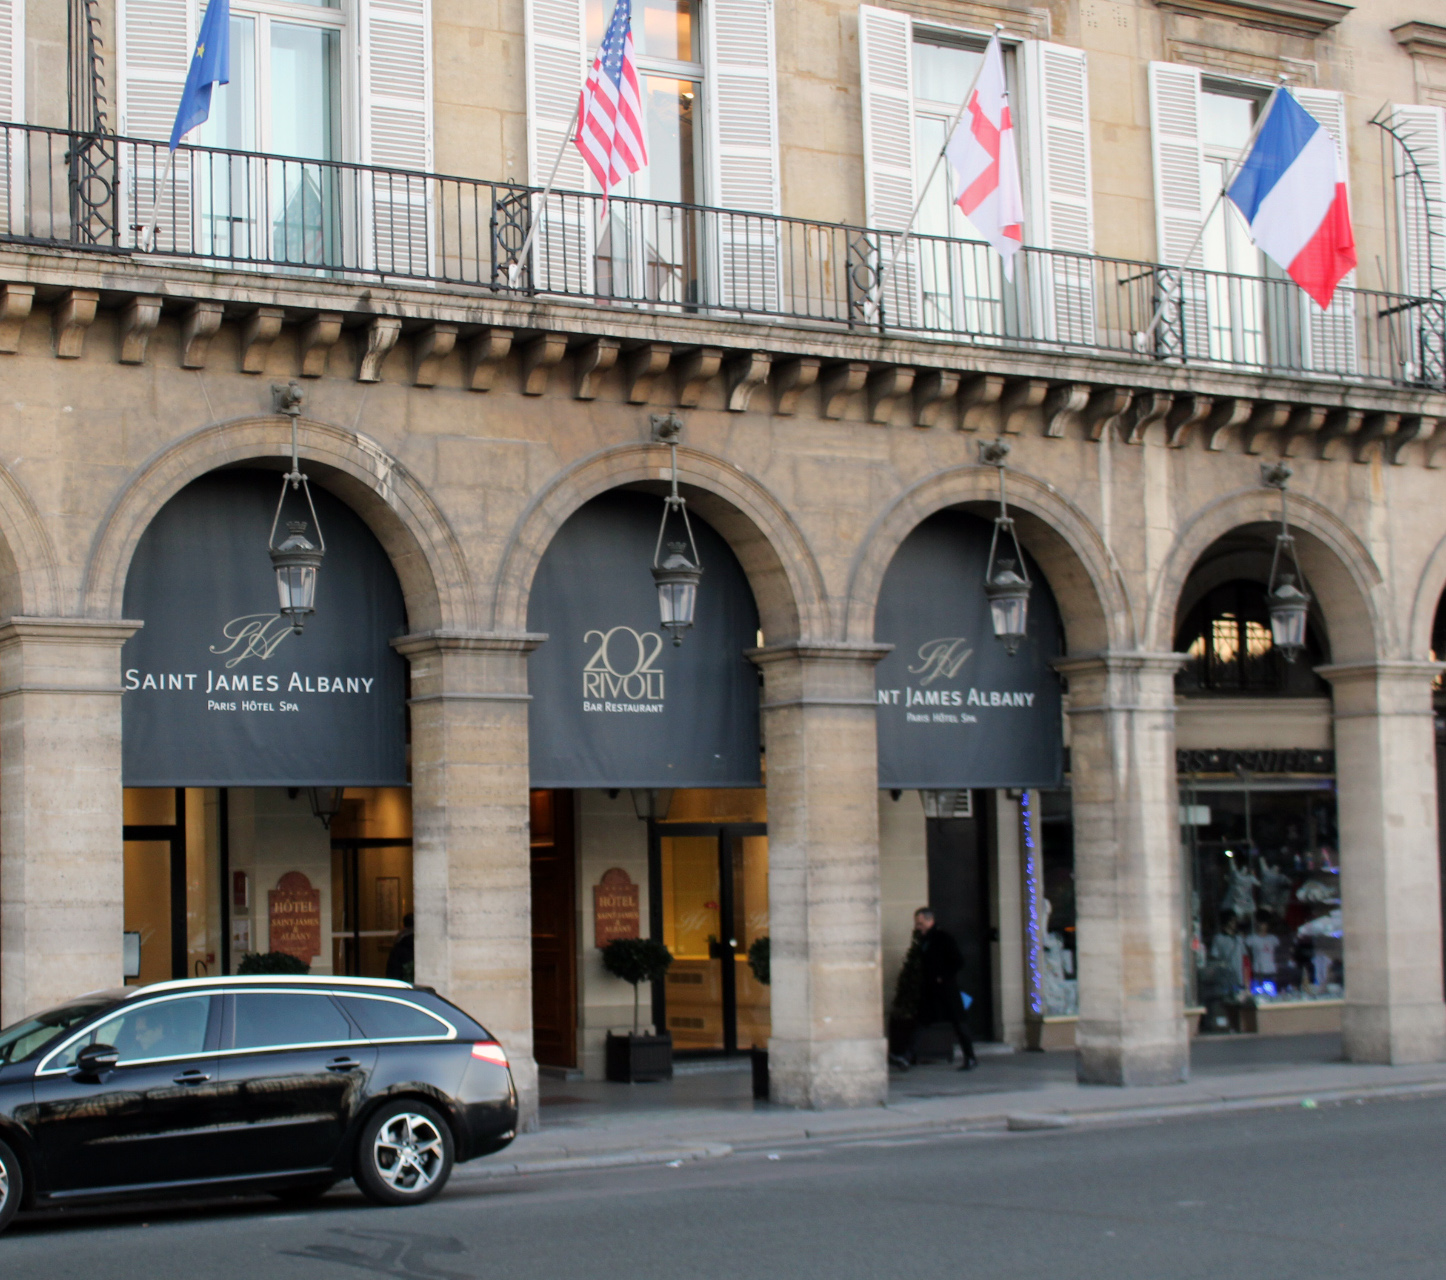 Saint James Albany, Paris, travelling, travel, blogging, blogger